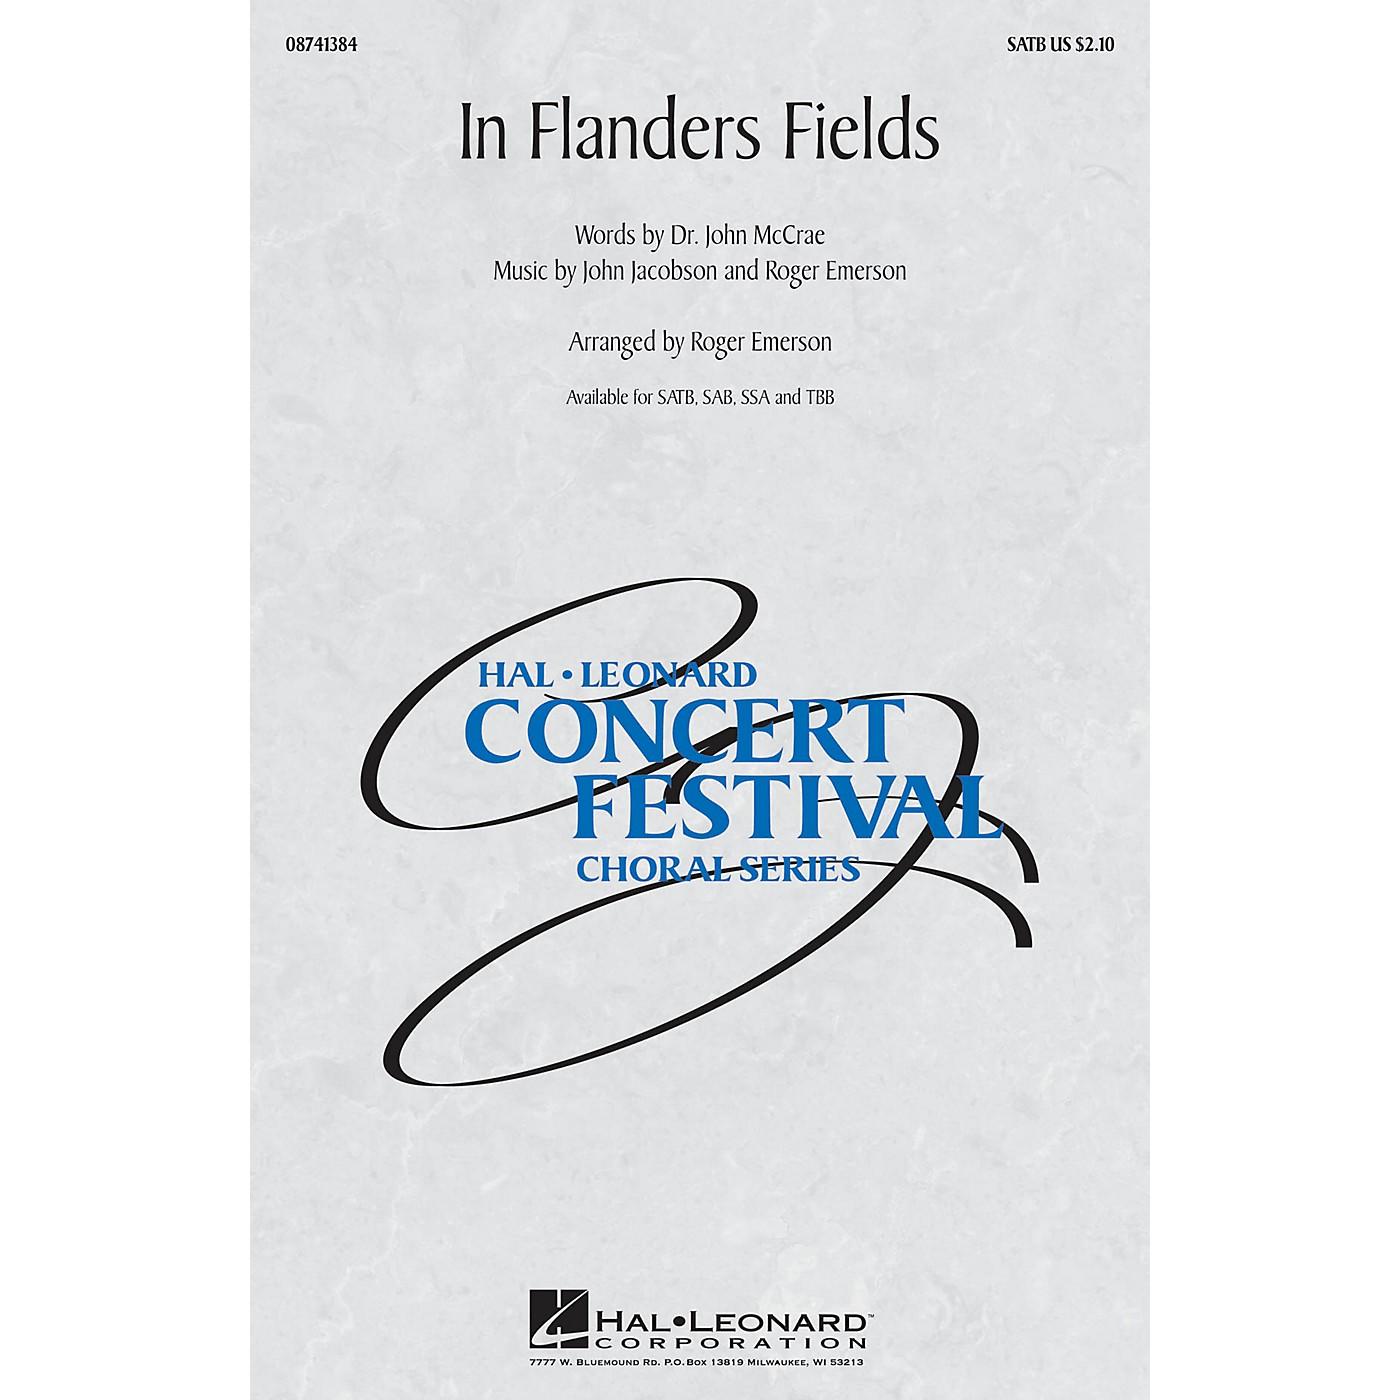 Hal Leonard In Flanders Fields SATB arranged by Roger Emerson thumbnail